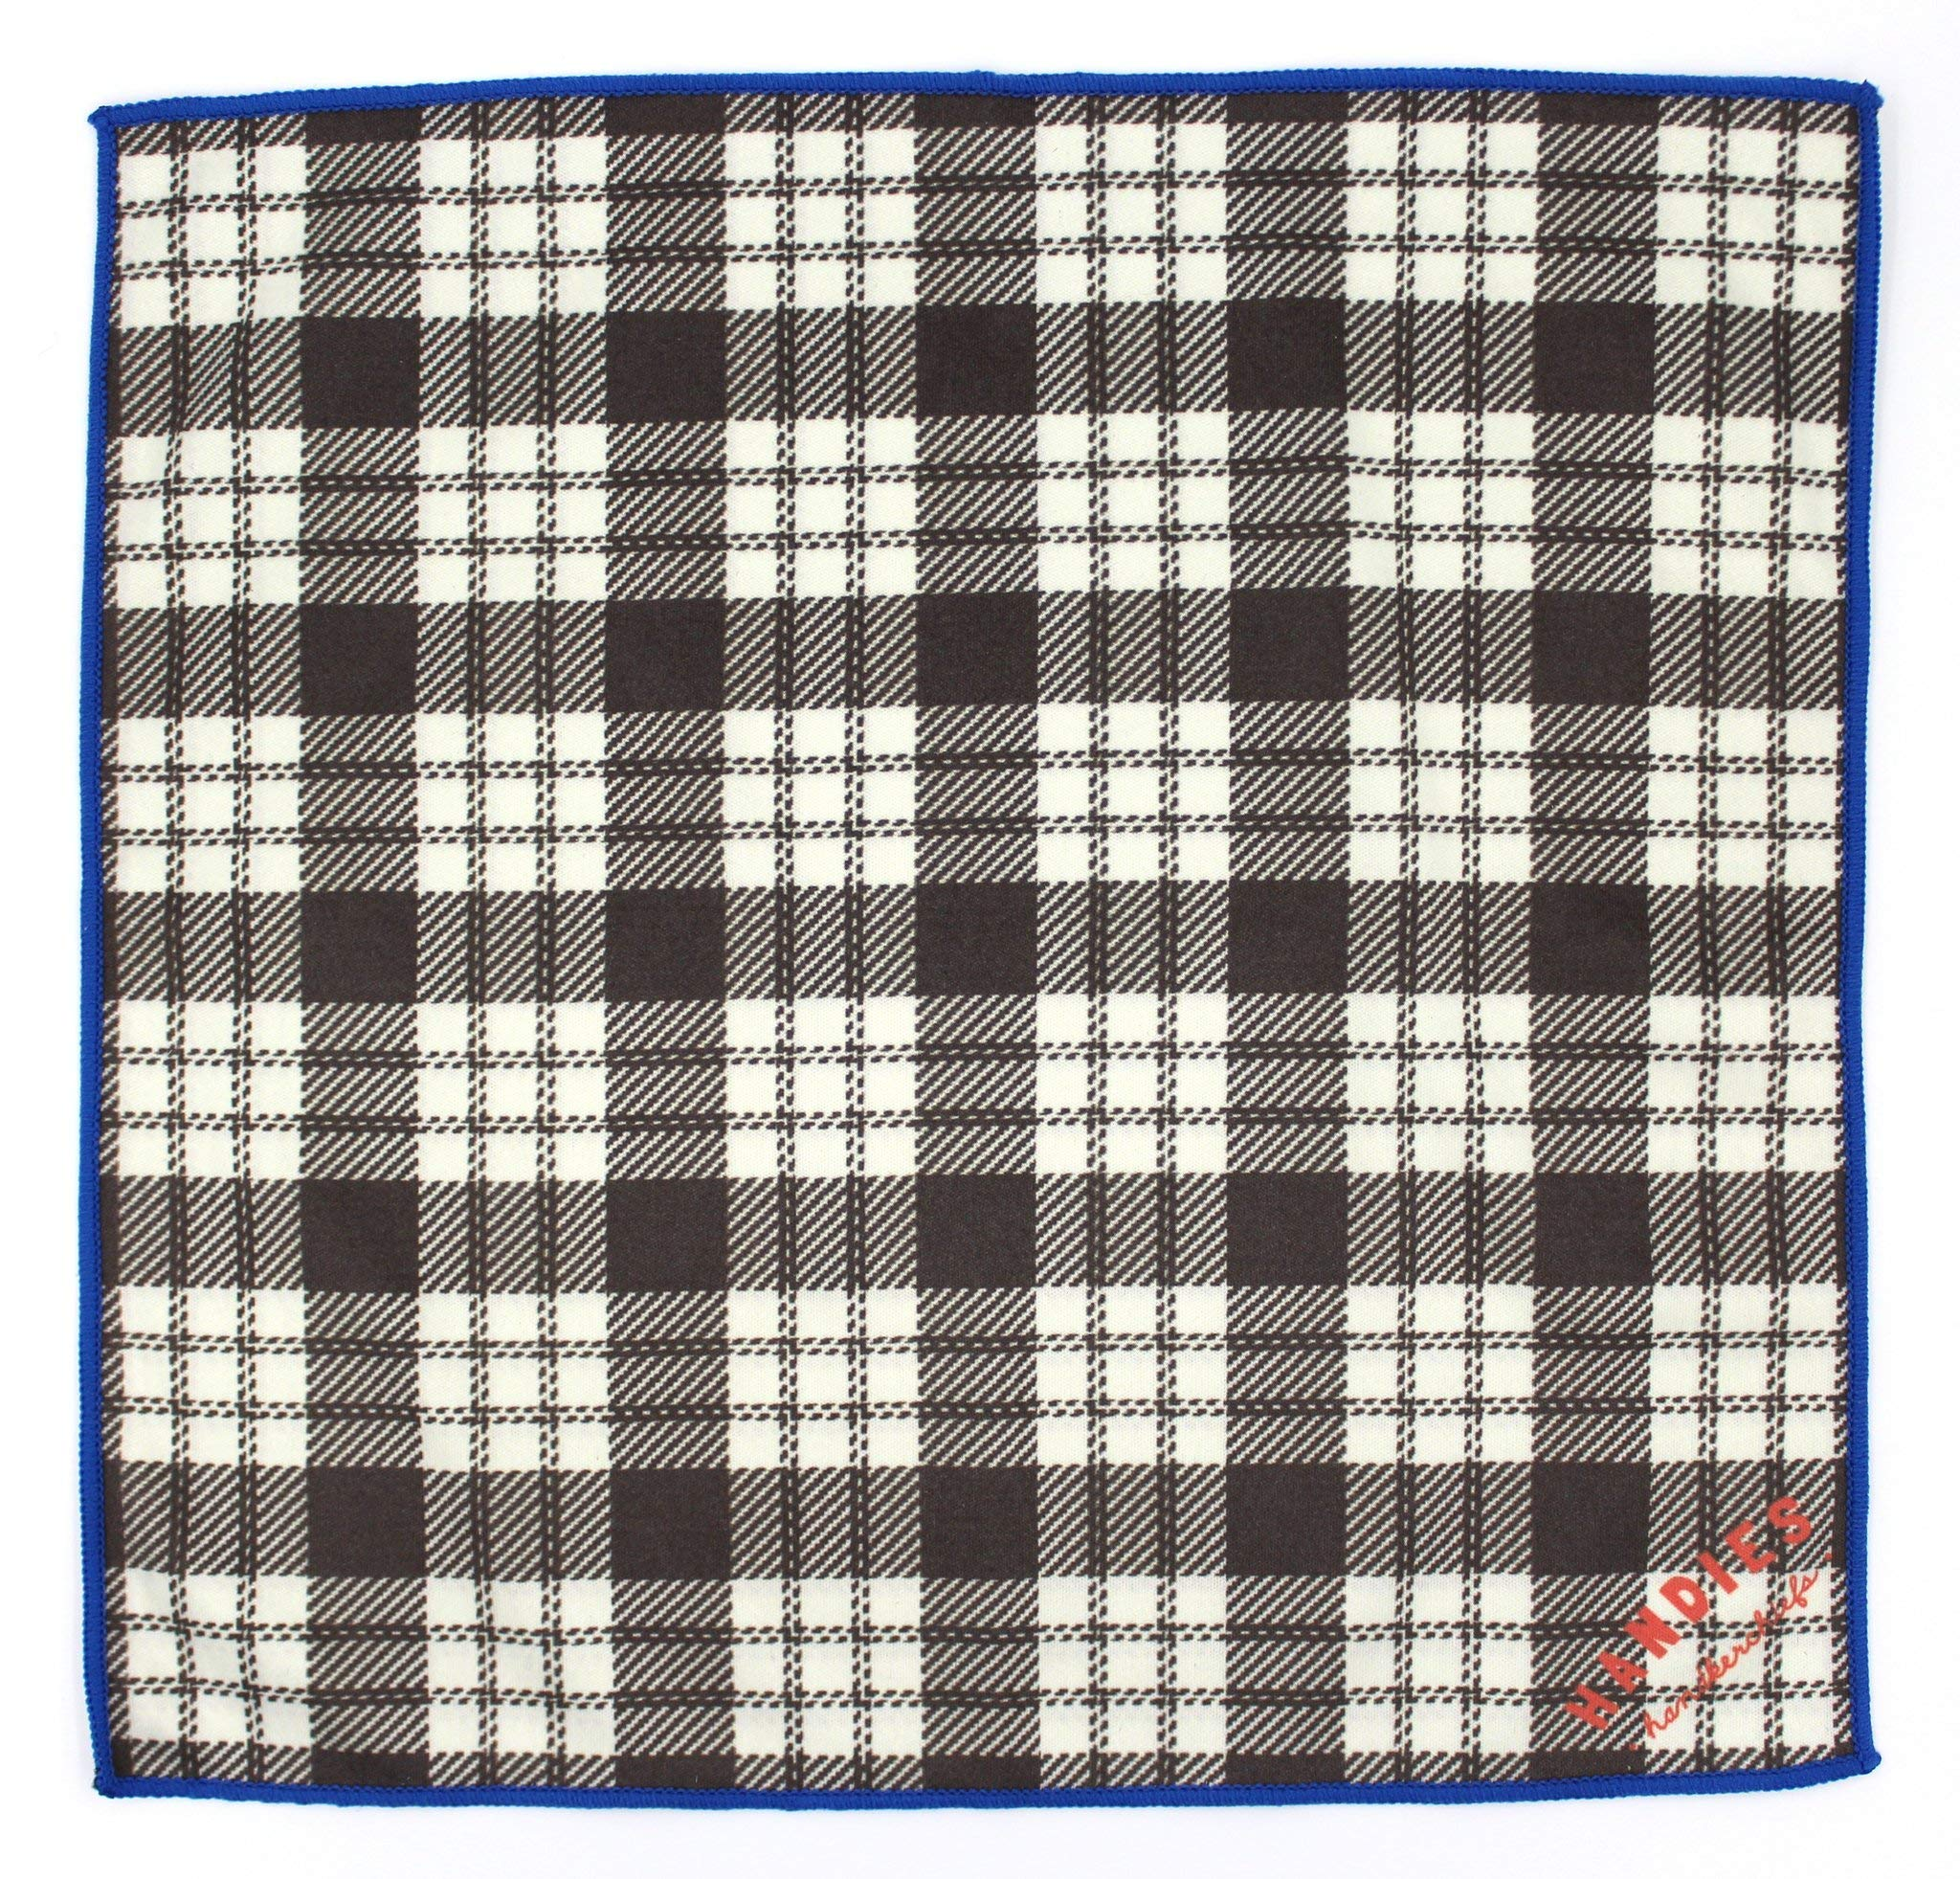 Handies Handkerchiefs Microfiber Not So Squares Hankies Cleaning Cloth Pocket Square (12'' x 12'')